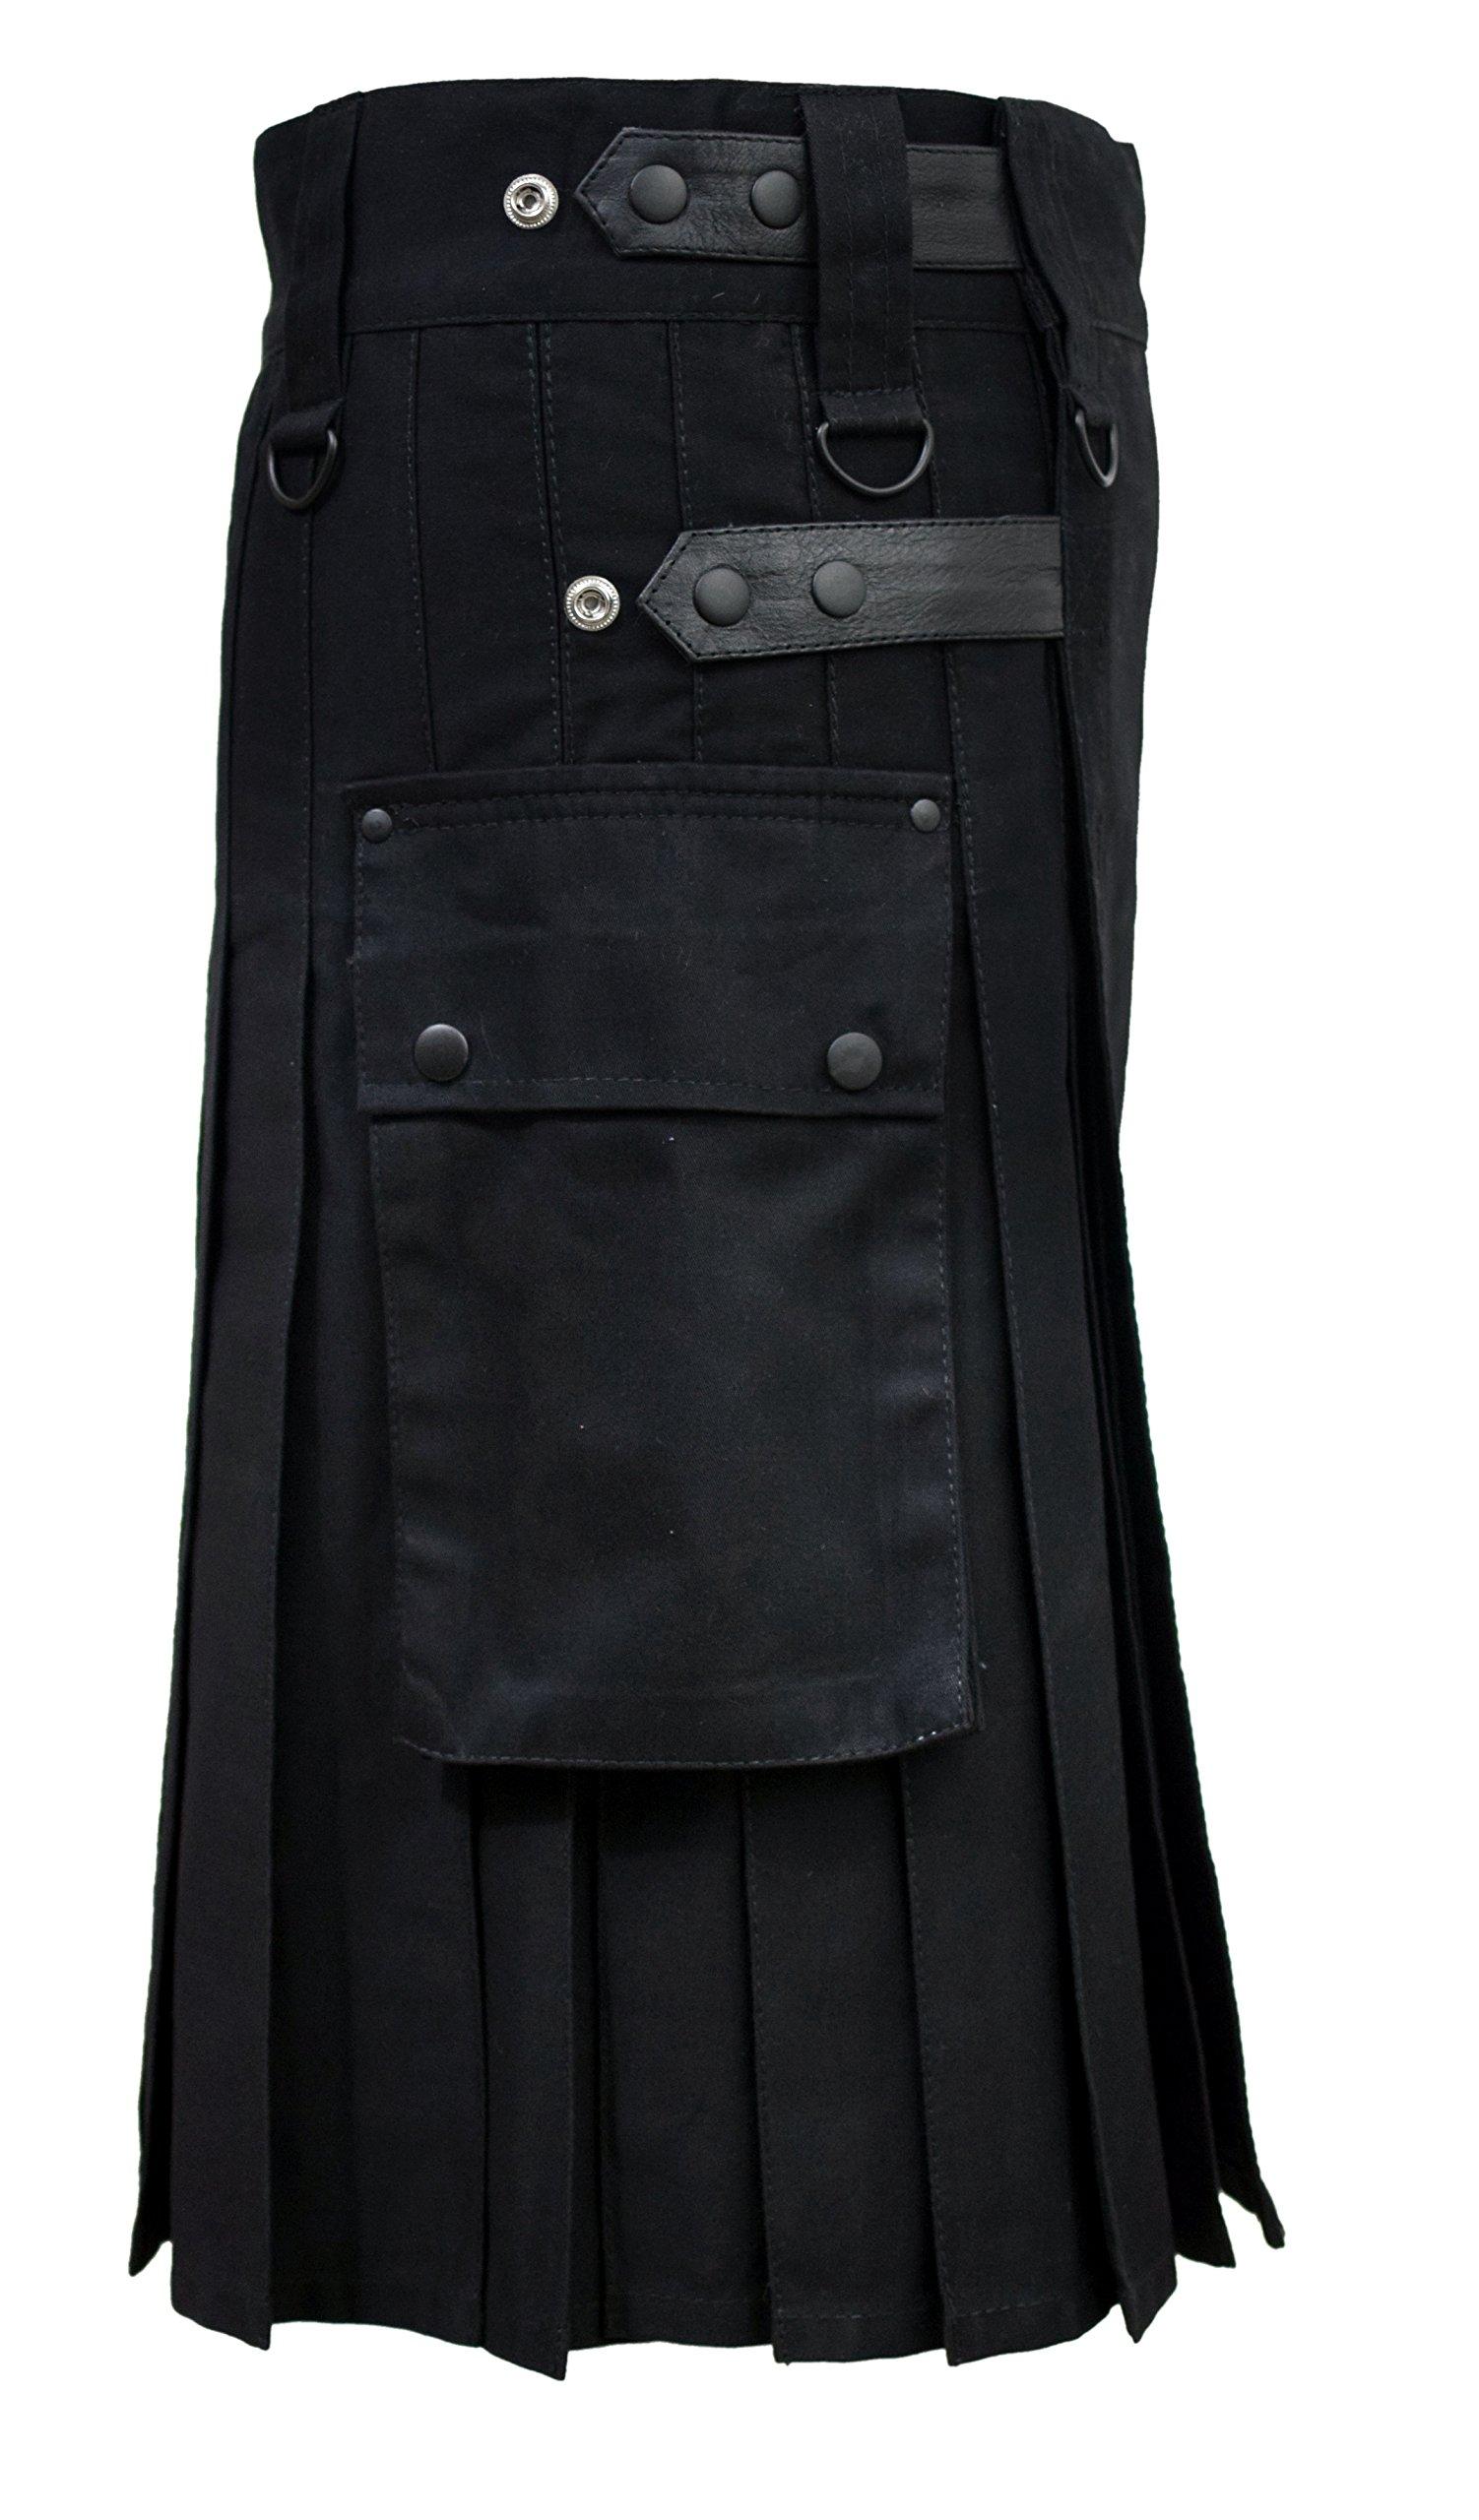 Men Black Leather Straps Fashion Sport Utility Kilt Deluxe Kilt Adjustable Sizes (48'')